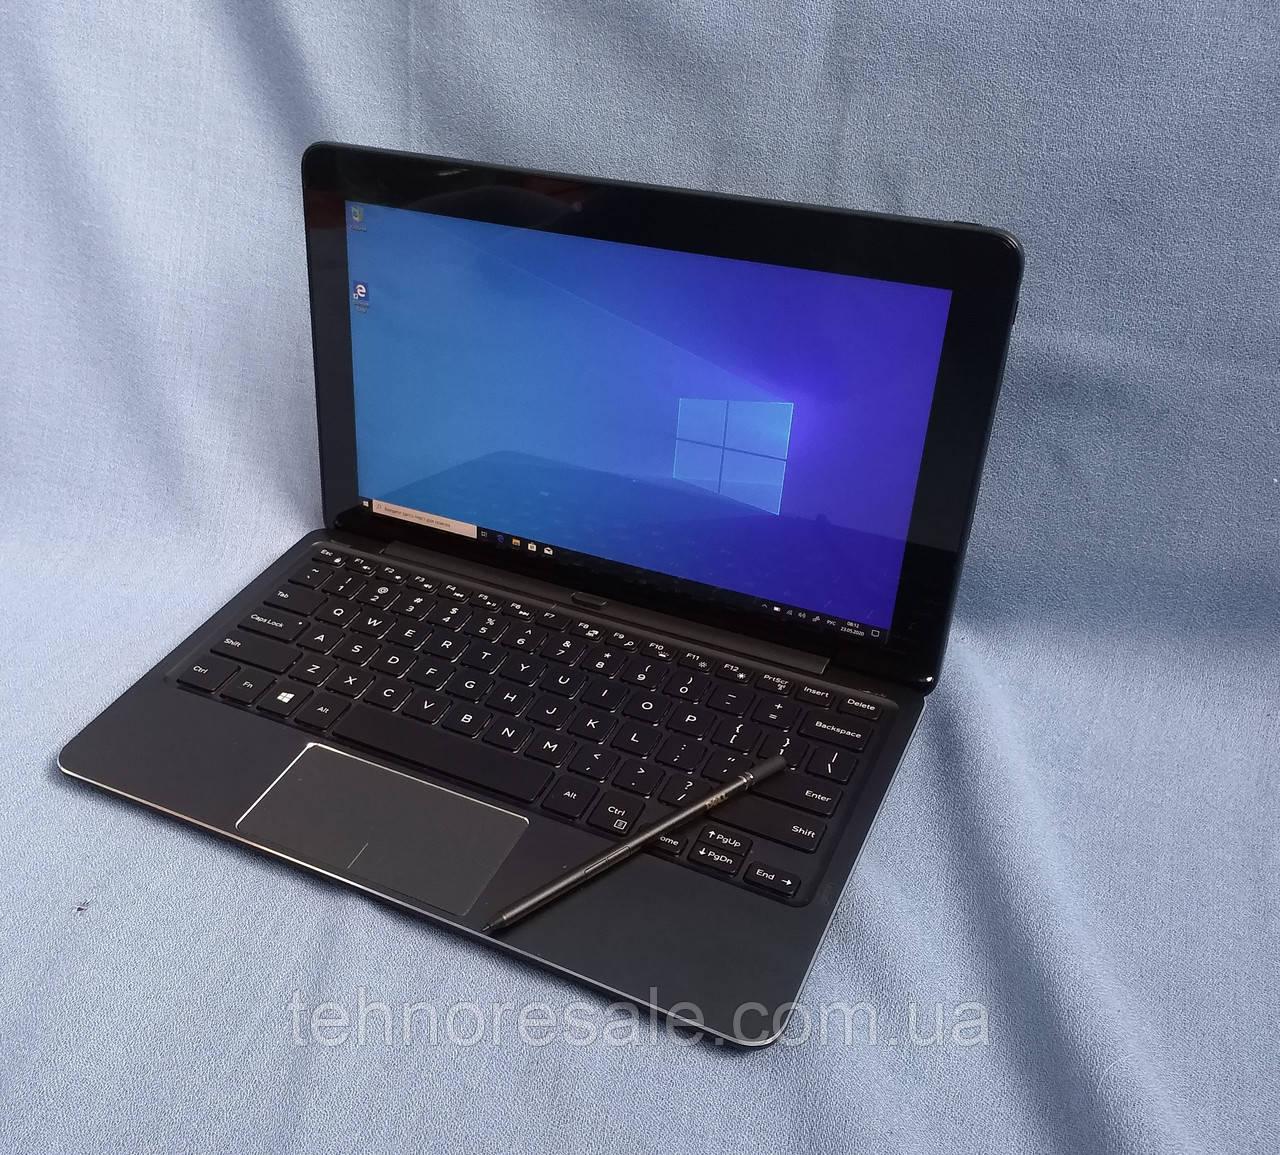 Планшет с клавиатурой Dell Latitude 11 5175, 10,8'', 8Gb, SSD 256Gb, WI-FI, две батареи, стилус